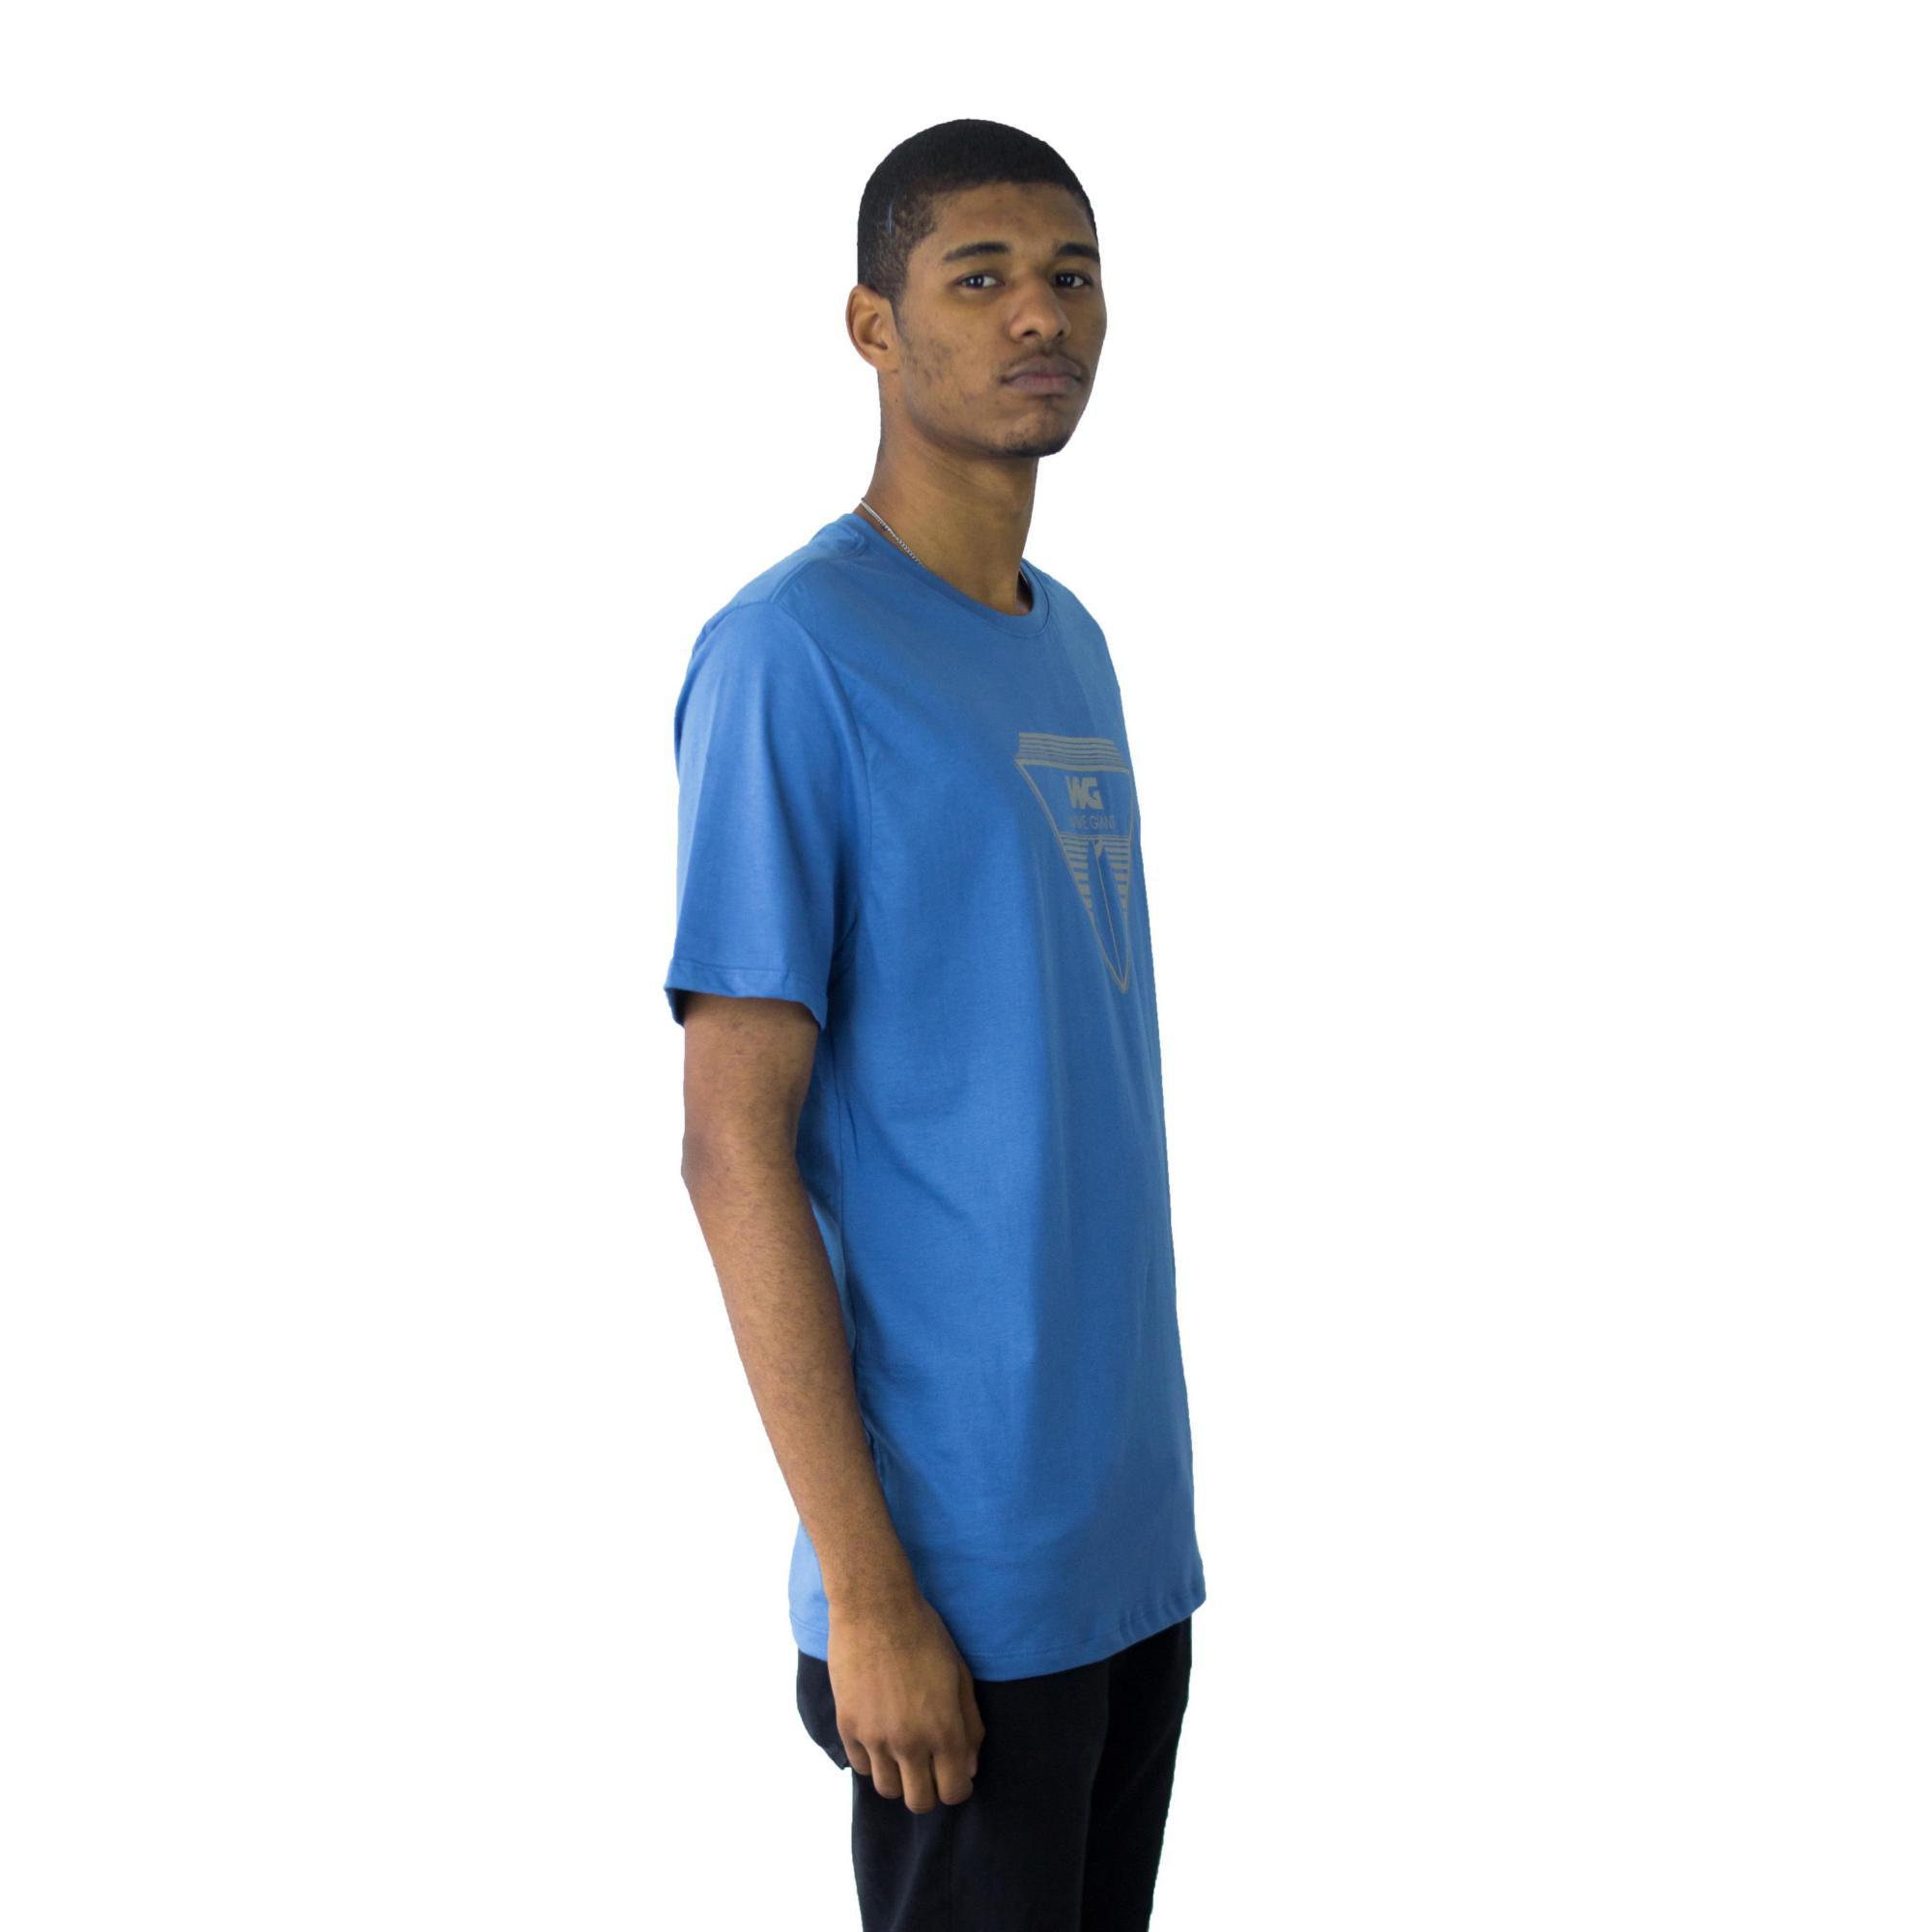 Camiseta WG Azul